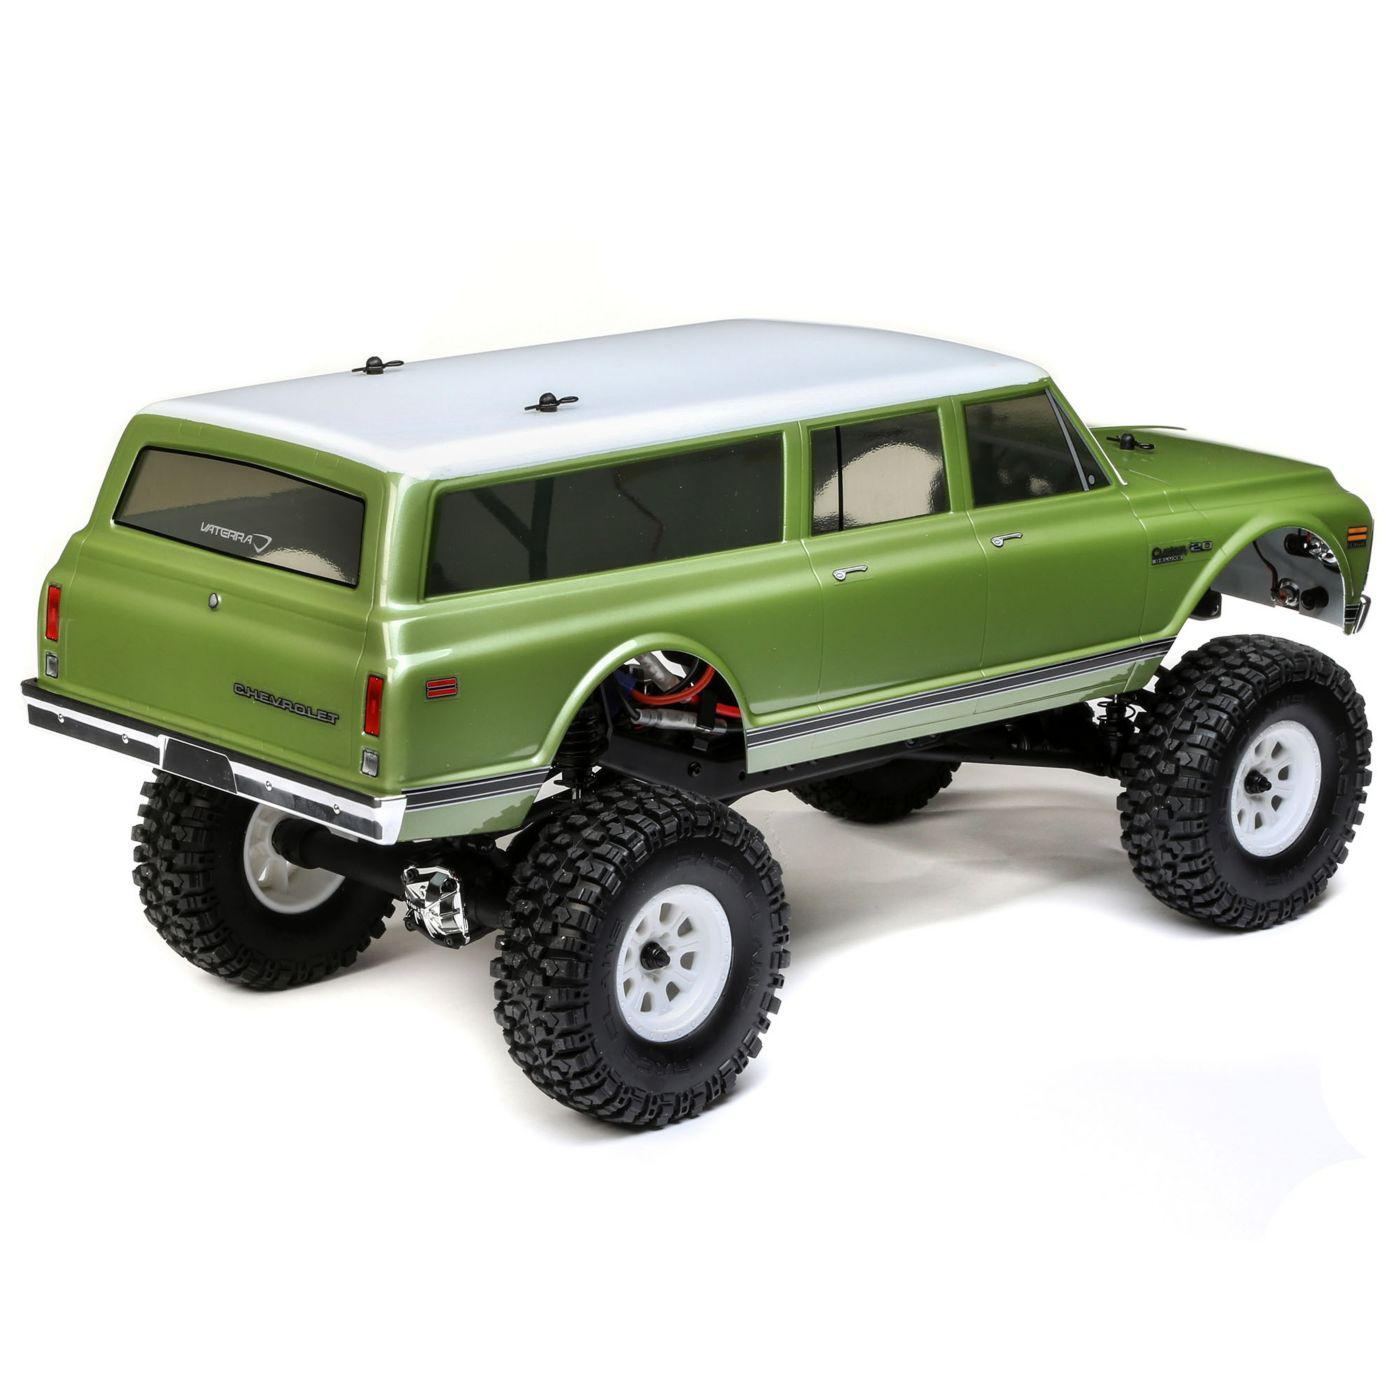 Vaterra 1972 Chevy Suburban Ascender - Rear